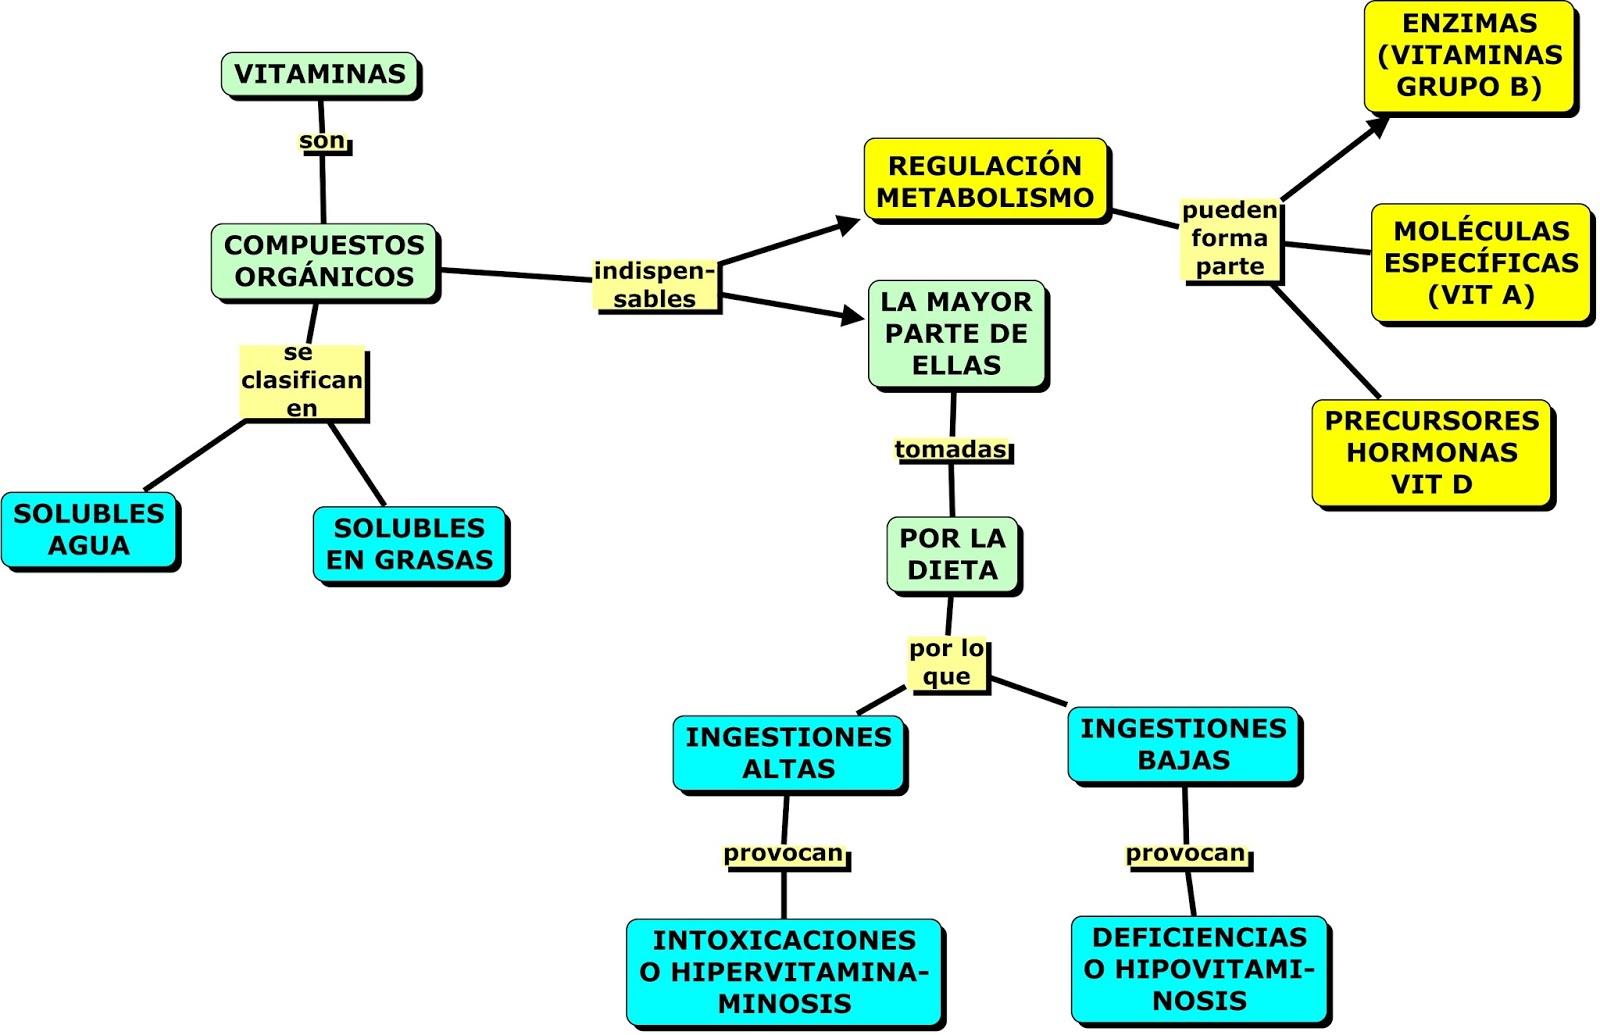 Cure esquema metabolismo celular con la naturaleza